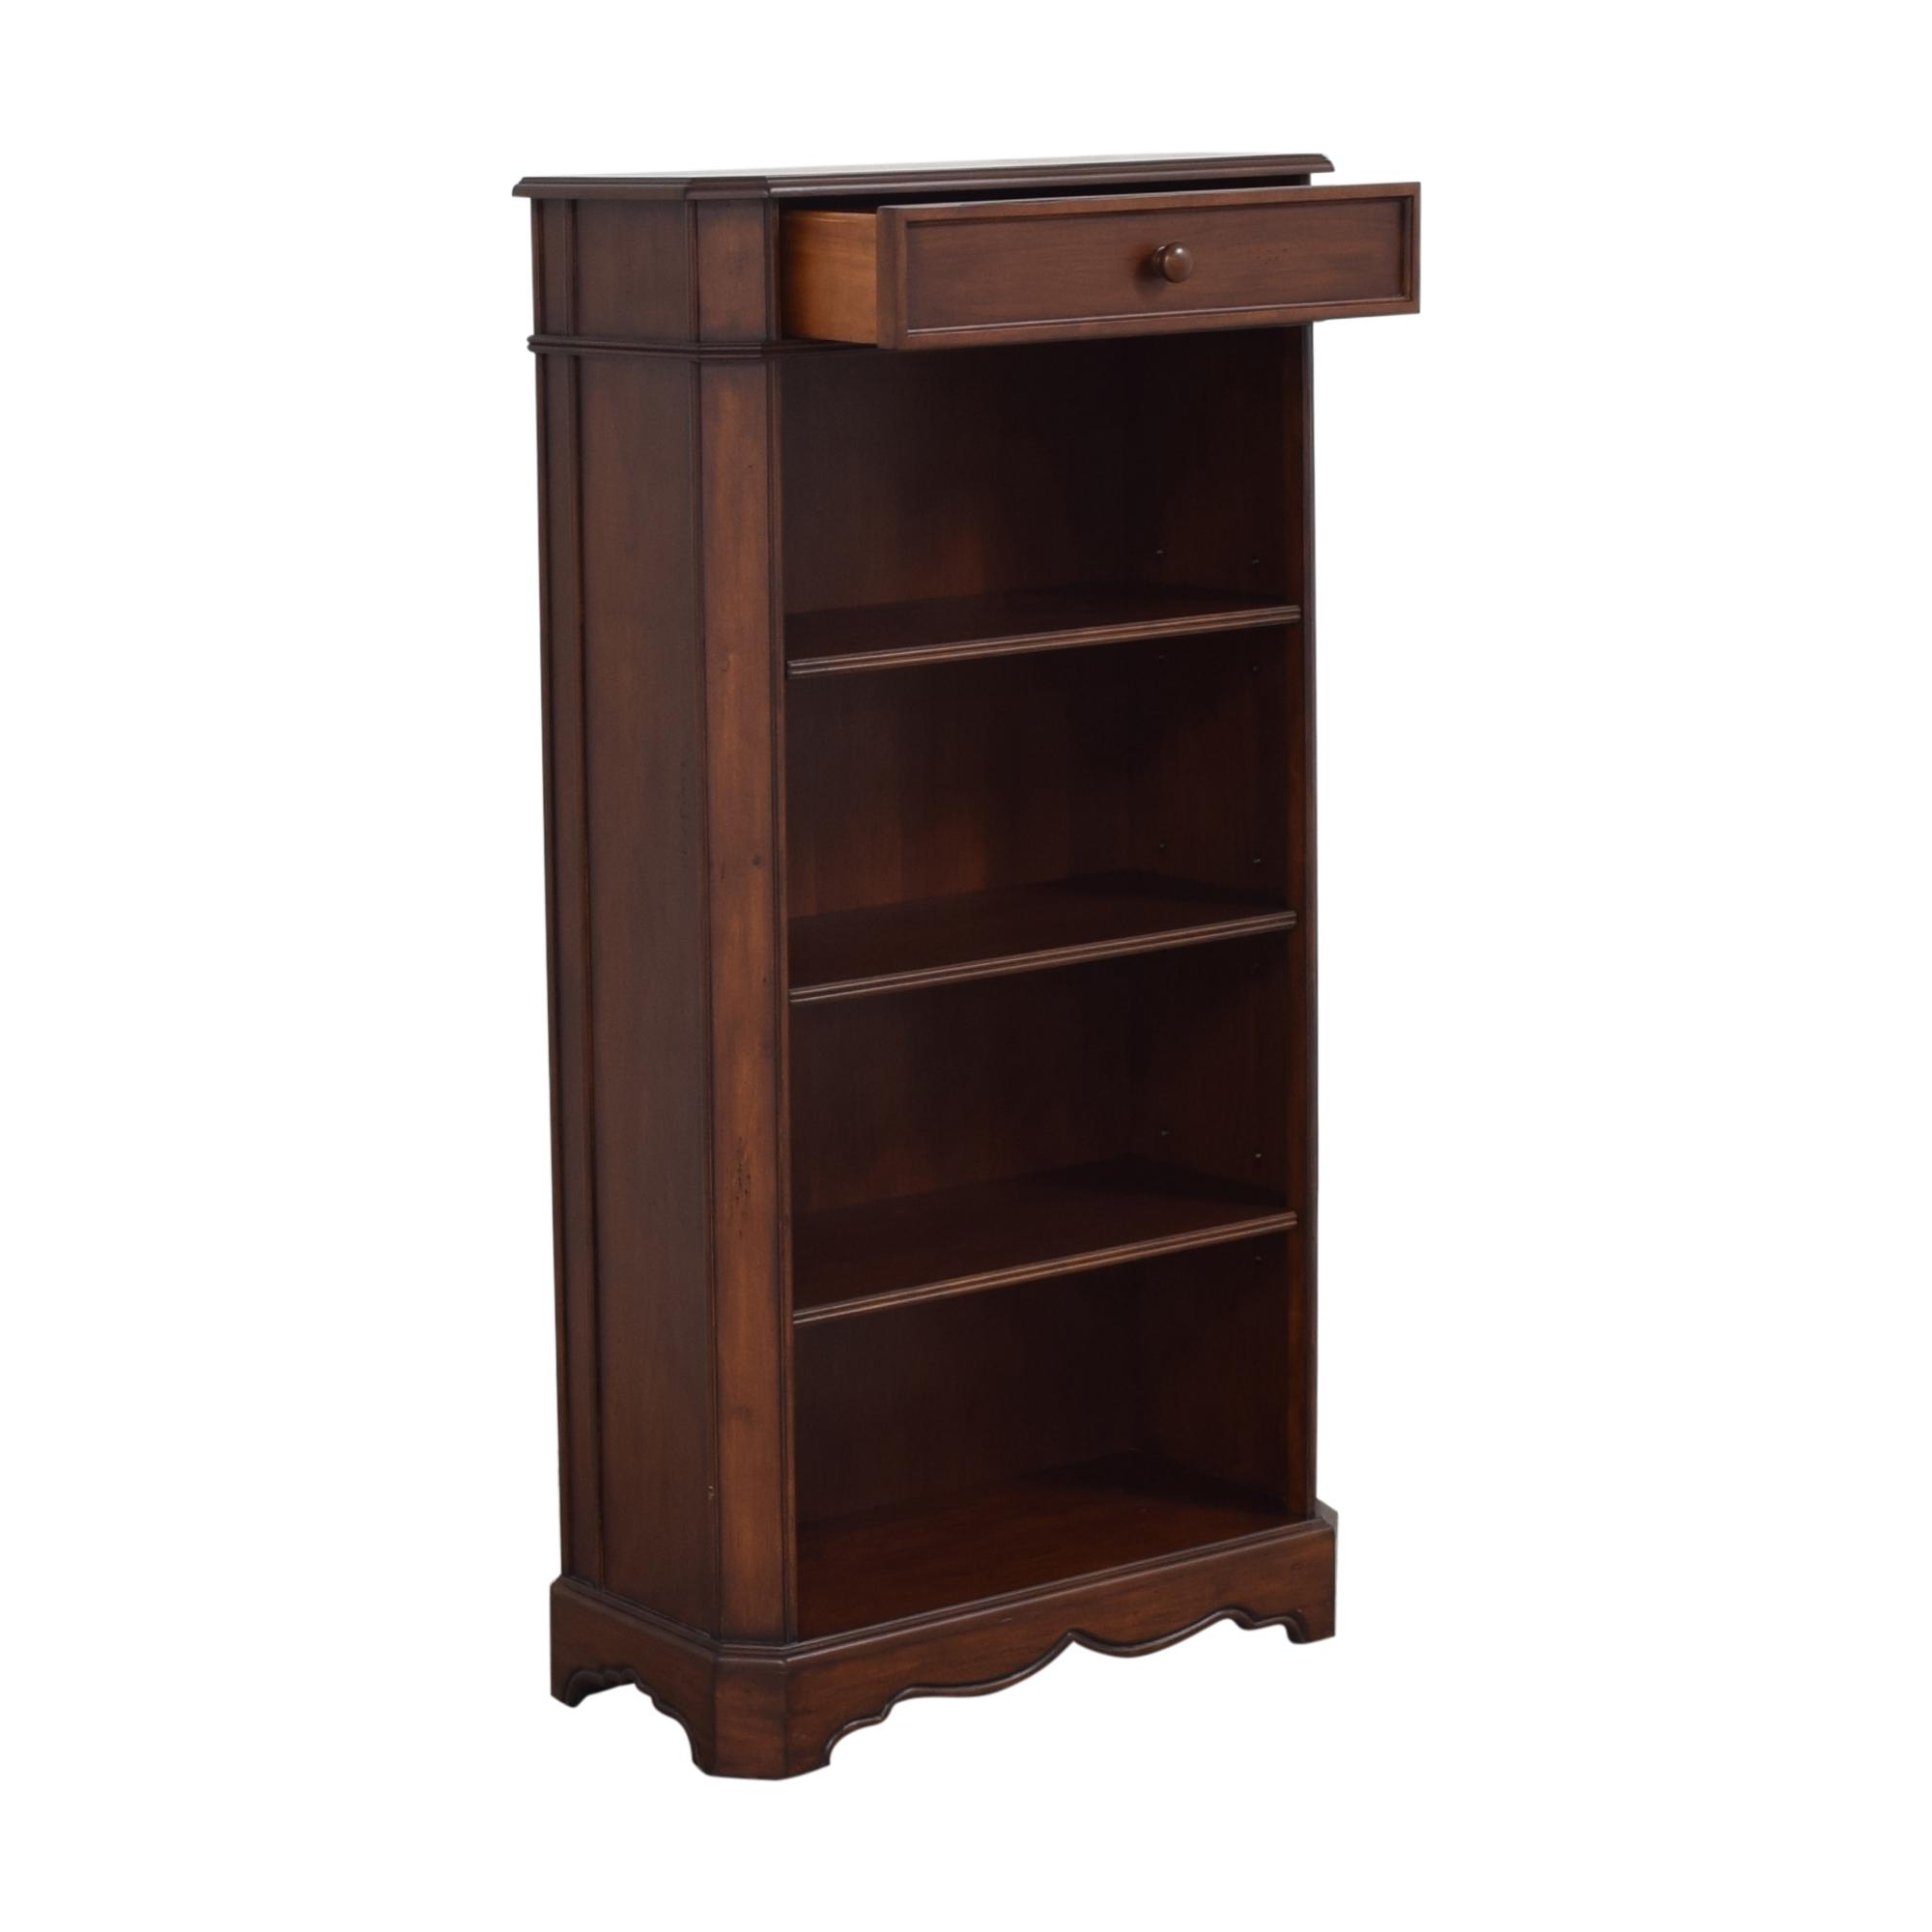 Single Drawer Bookcase sale